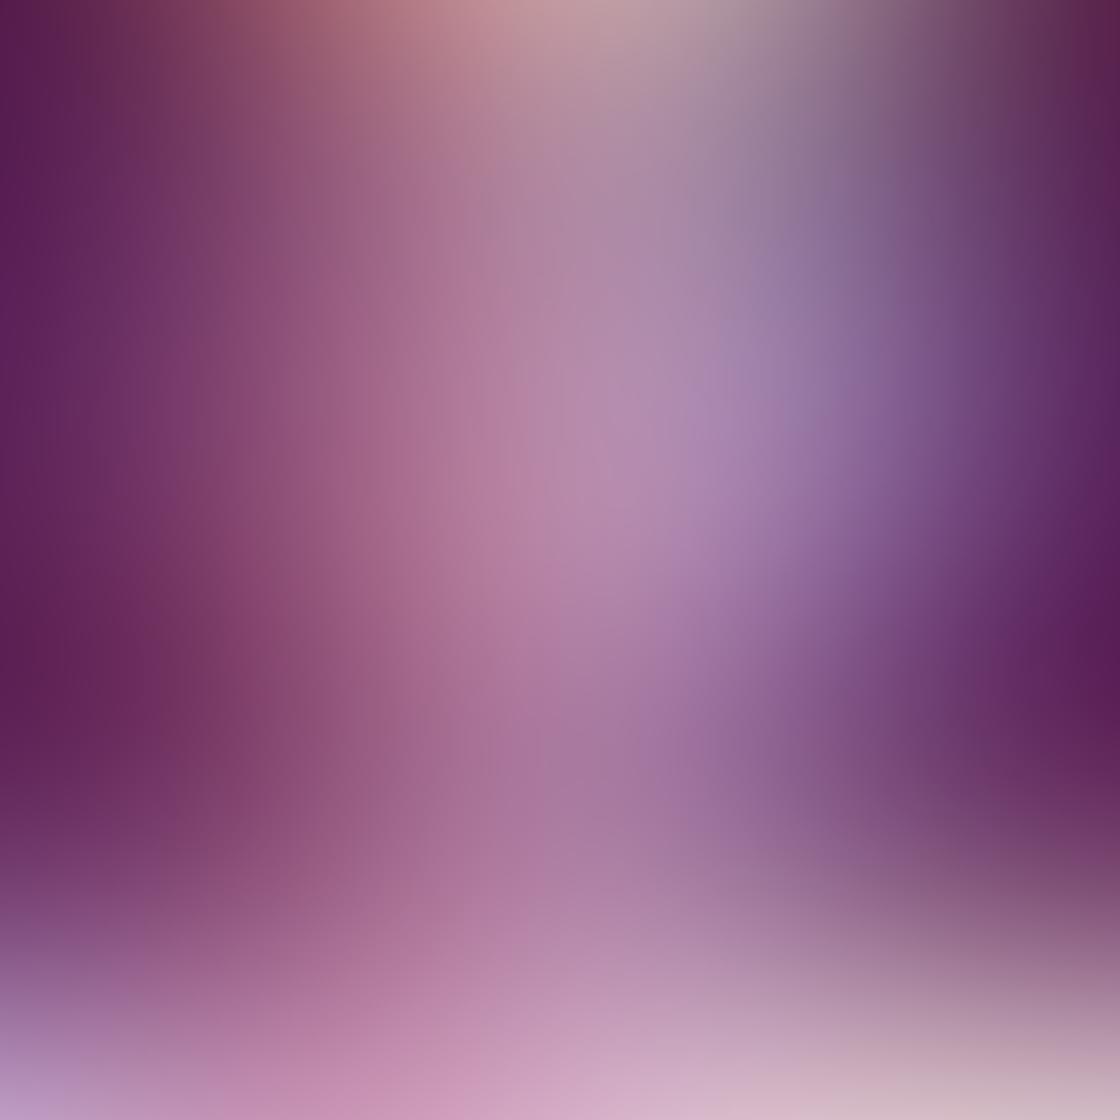 iPhone Photos Abstract Art 2